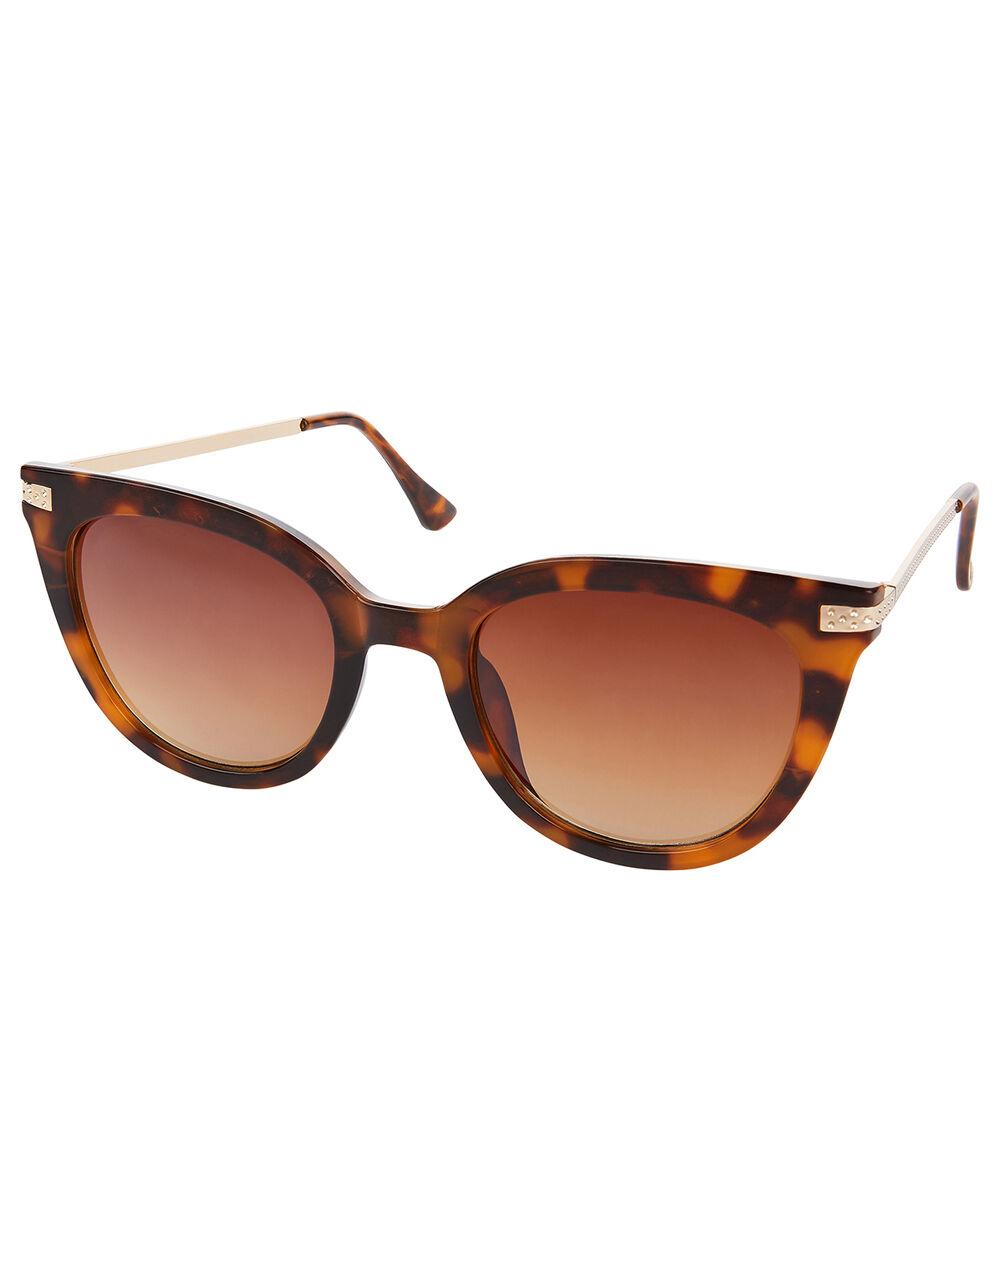 Caroline Cat-Eye Tortoiseshell Sunglasses, , large